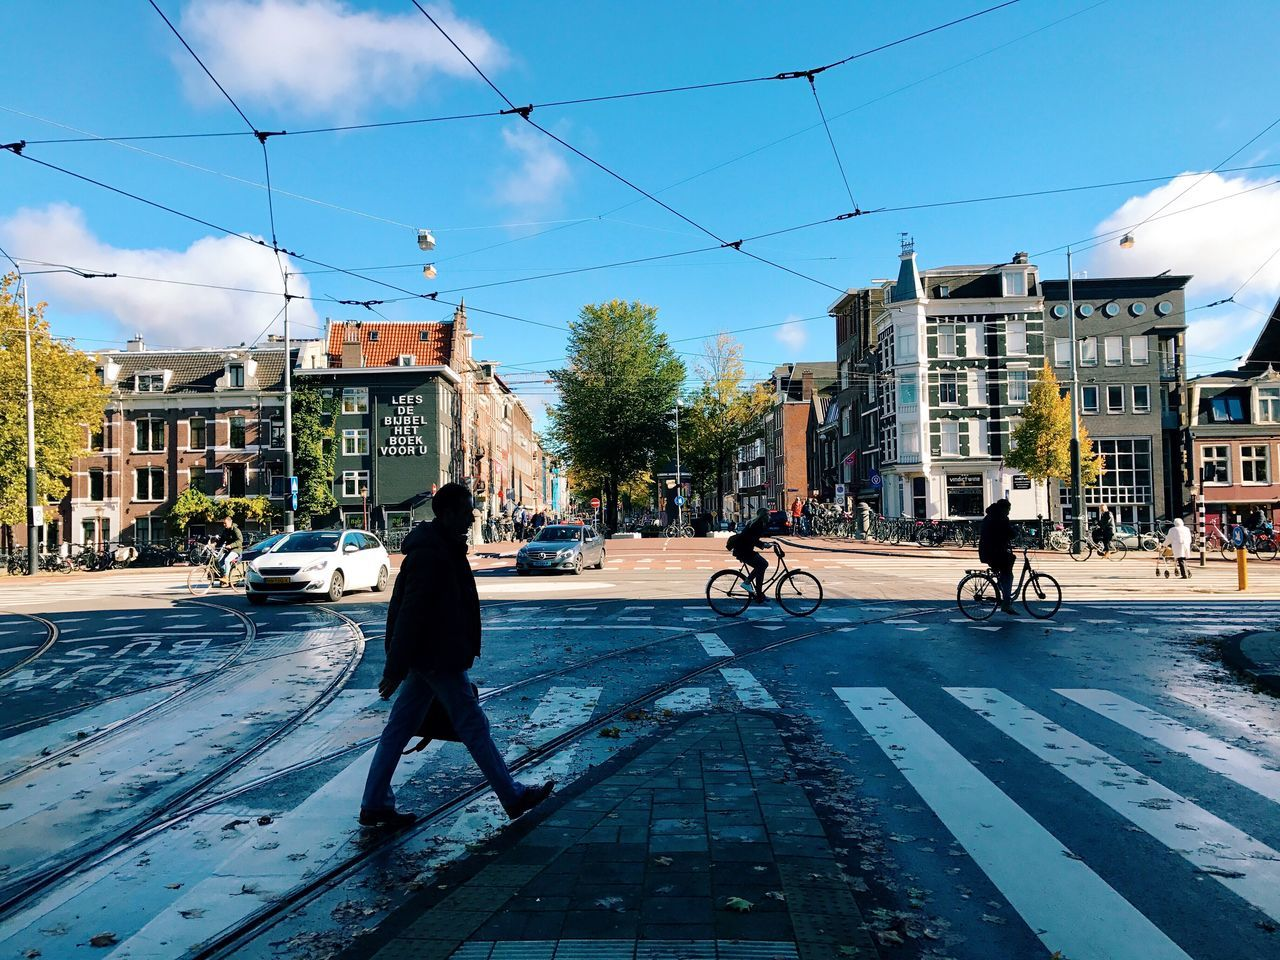 Street Sky Day City Life City Amsterdam Amsterdamcity Jordaan Student First Eyeem Photo